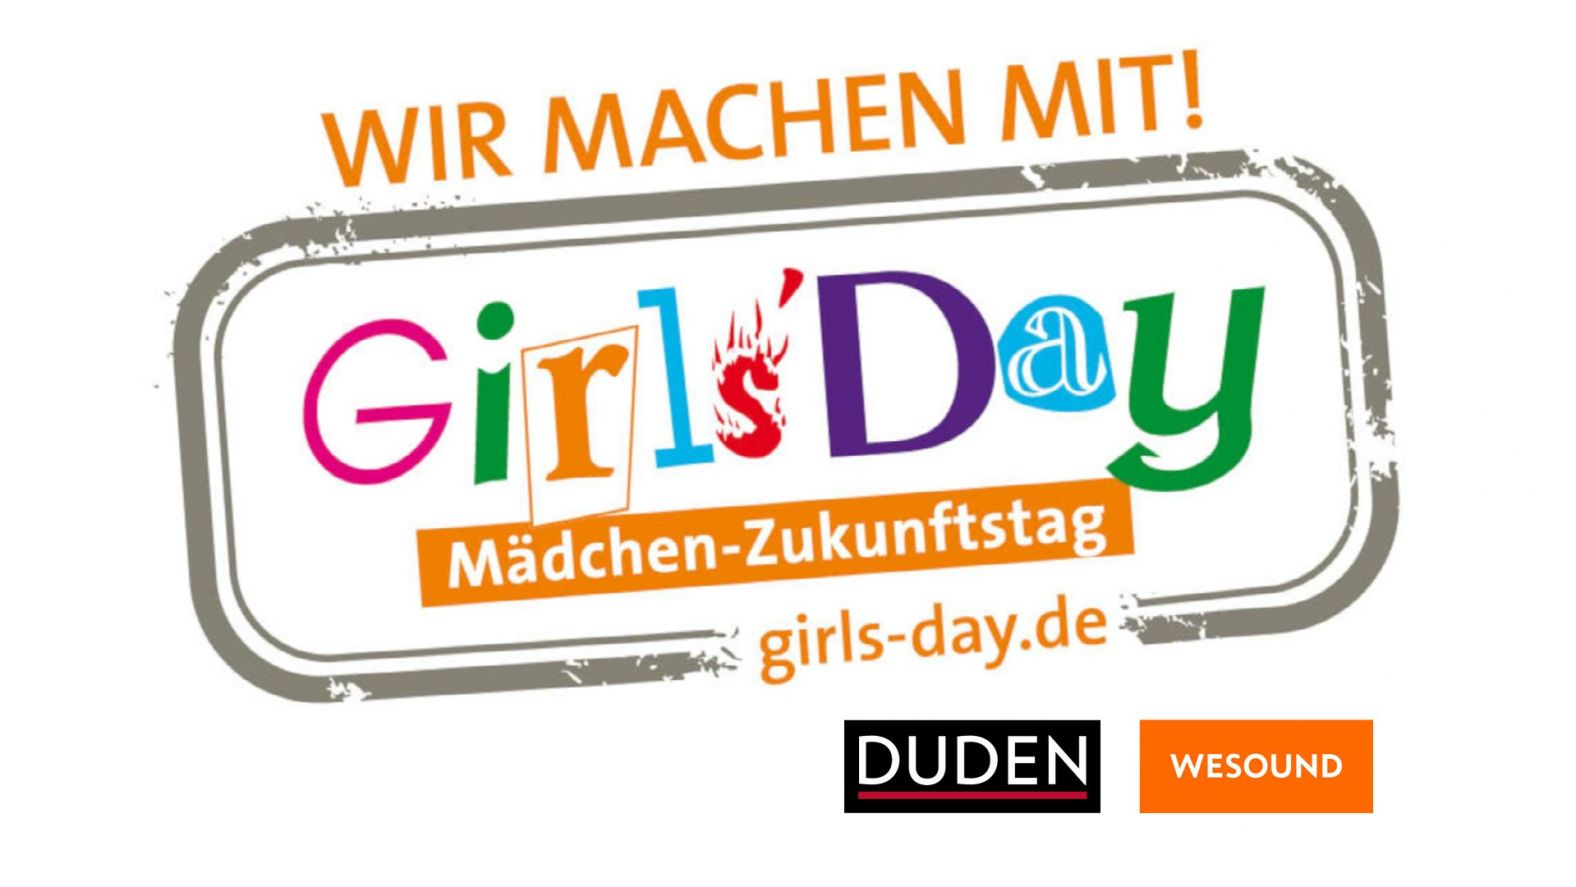 20200311_WS_GirlsDay_Visual_Duden_1920x1080_RZ